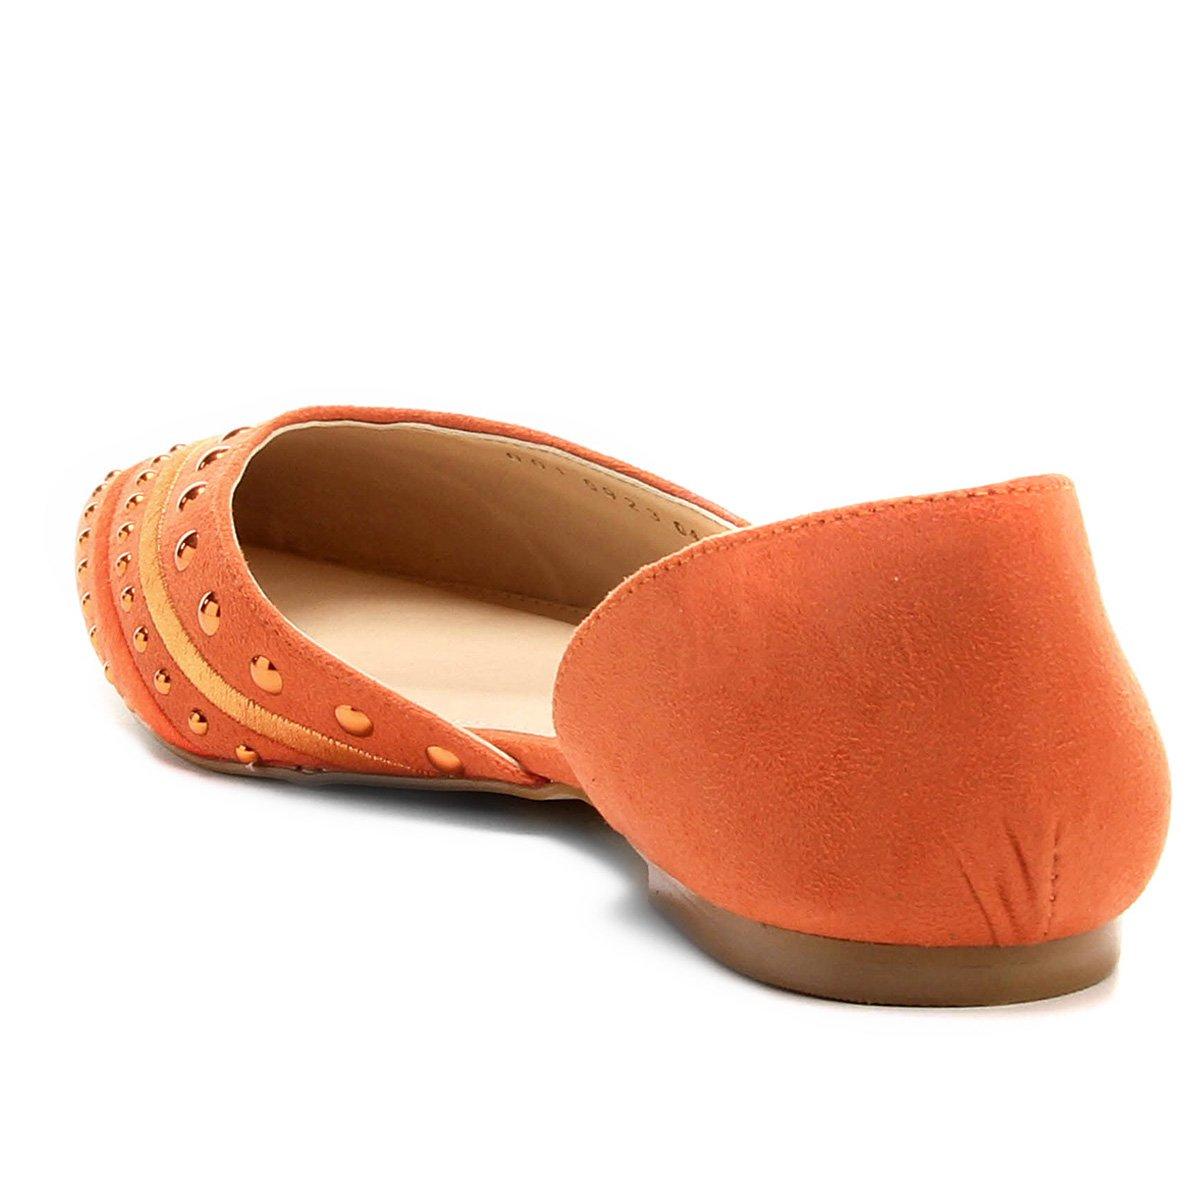 Shoestock Laranja Bico Sapatilha Shoestock Feminina Sapatilha Fino qEwxT